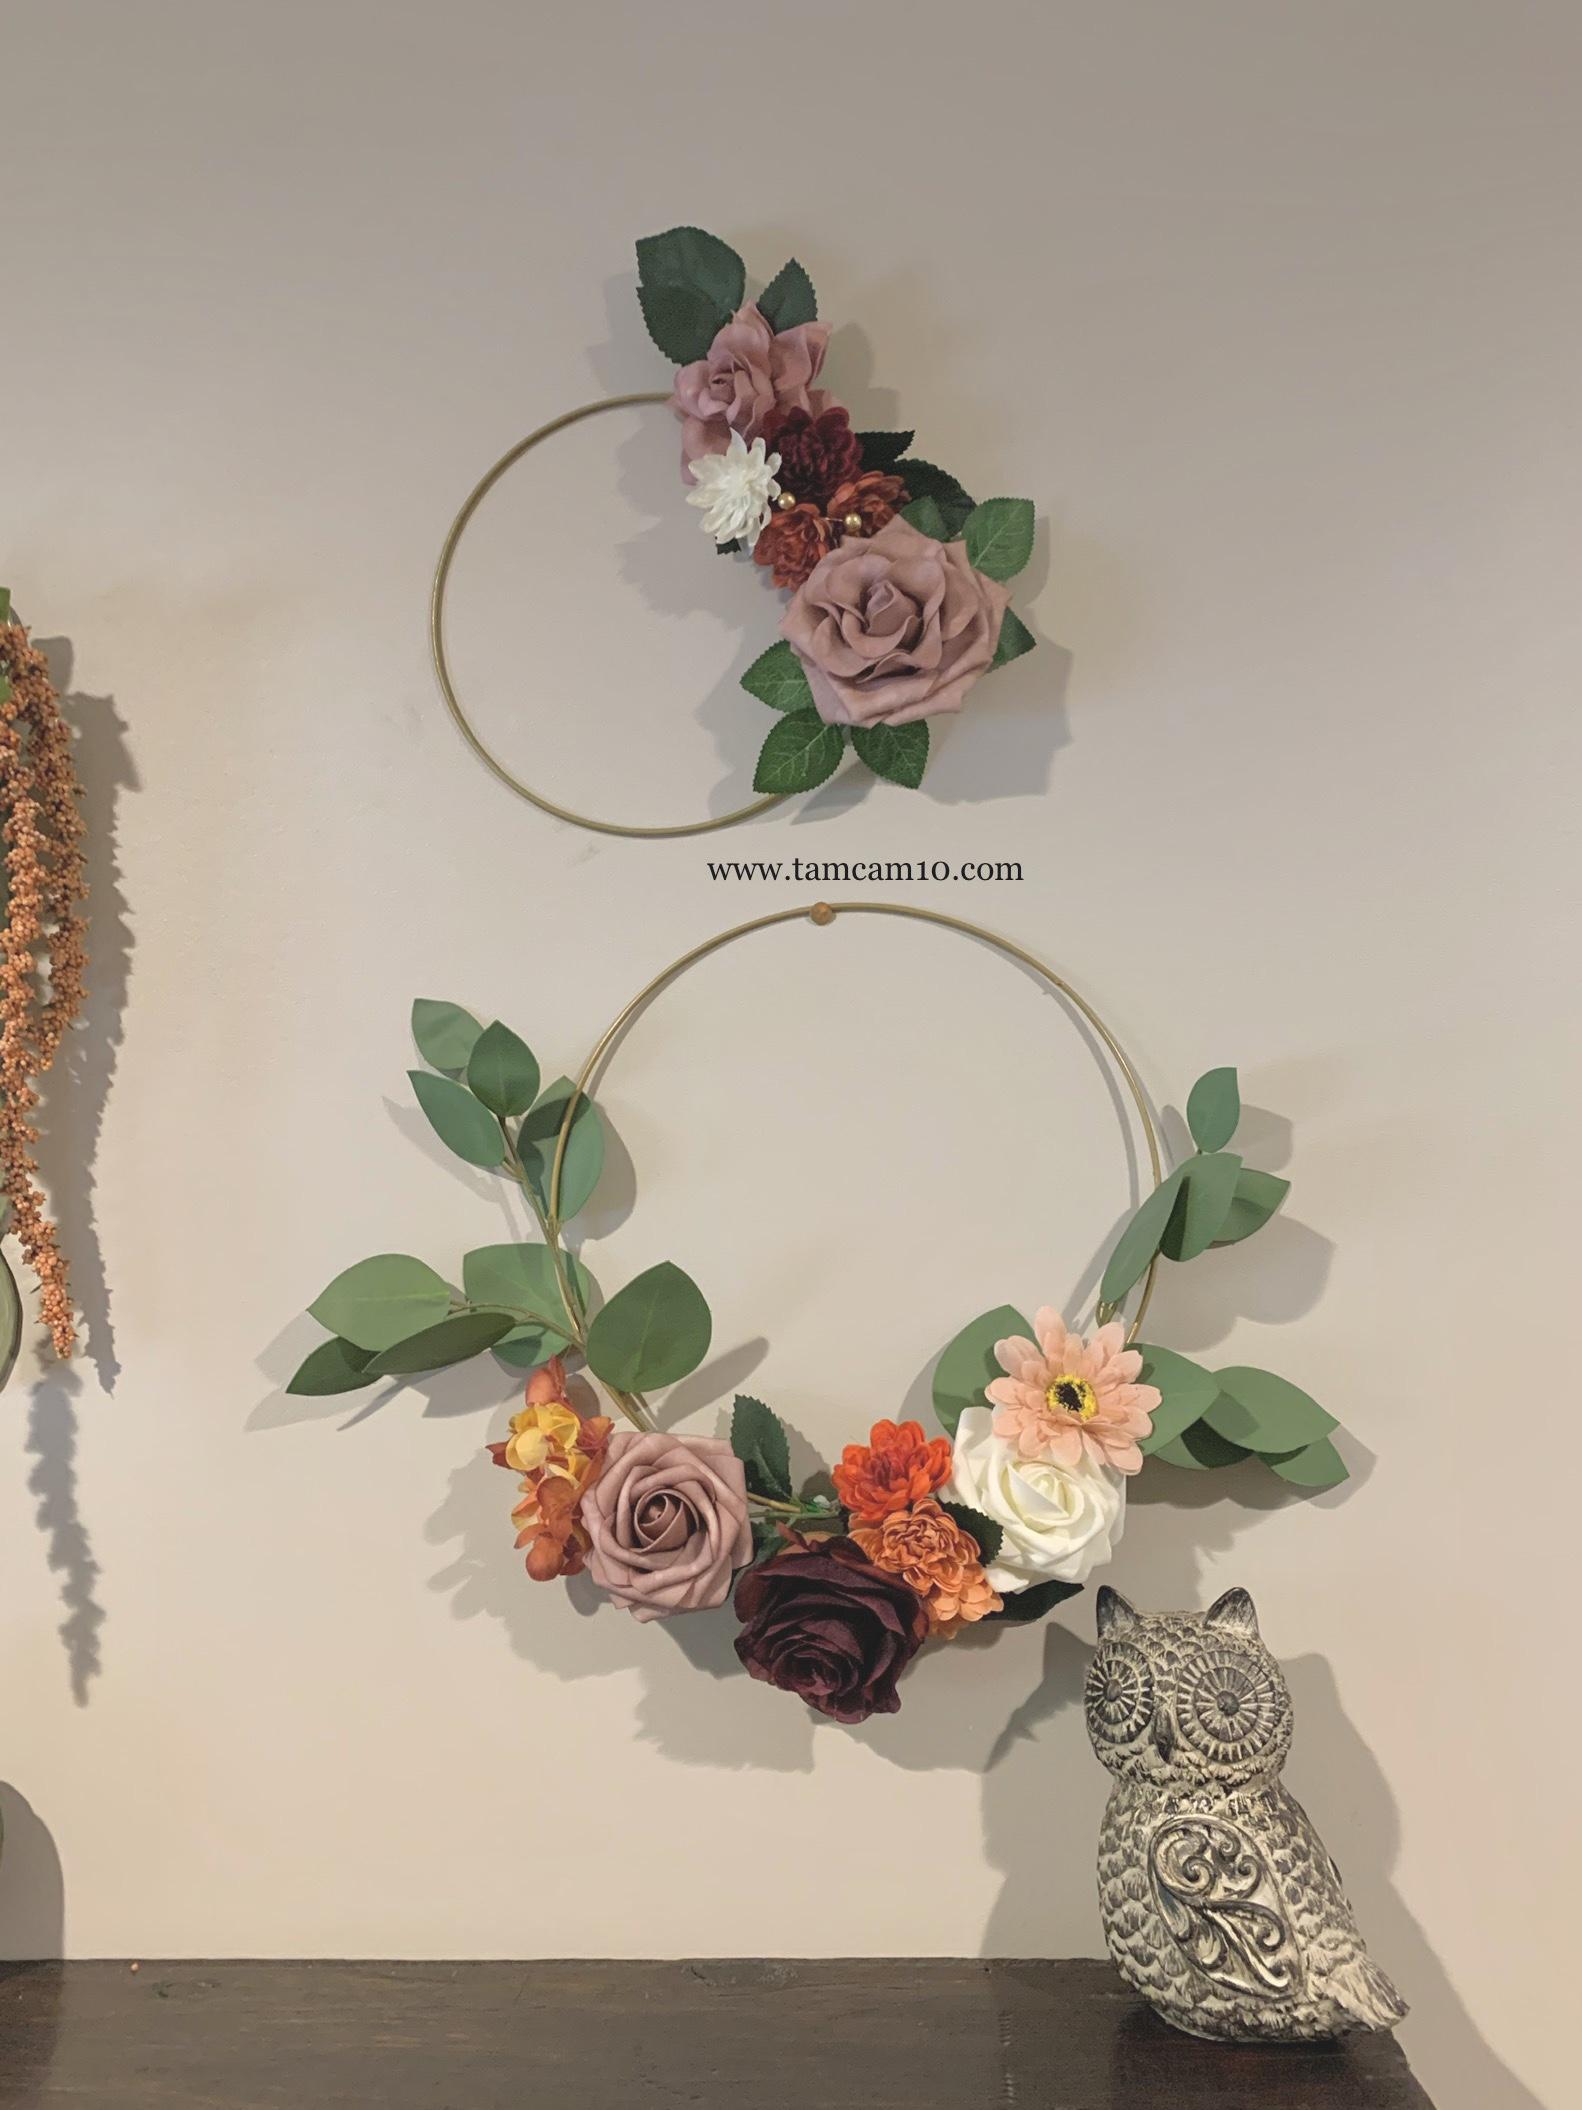 Fall Decor | Entry Way | Pretty Fall | Fall Decor Ideas | Floral Hoops | Fall Florals | Owl | tamcam10